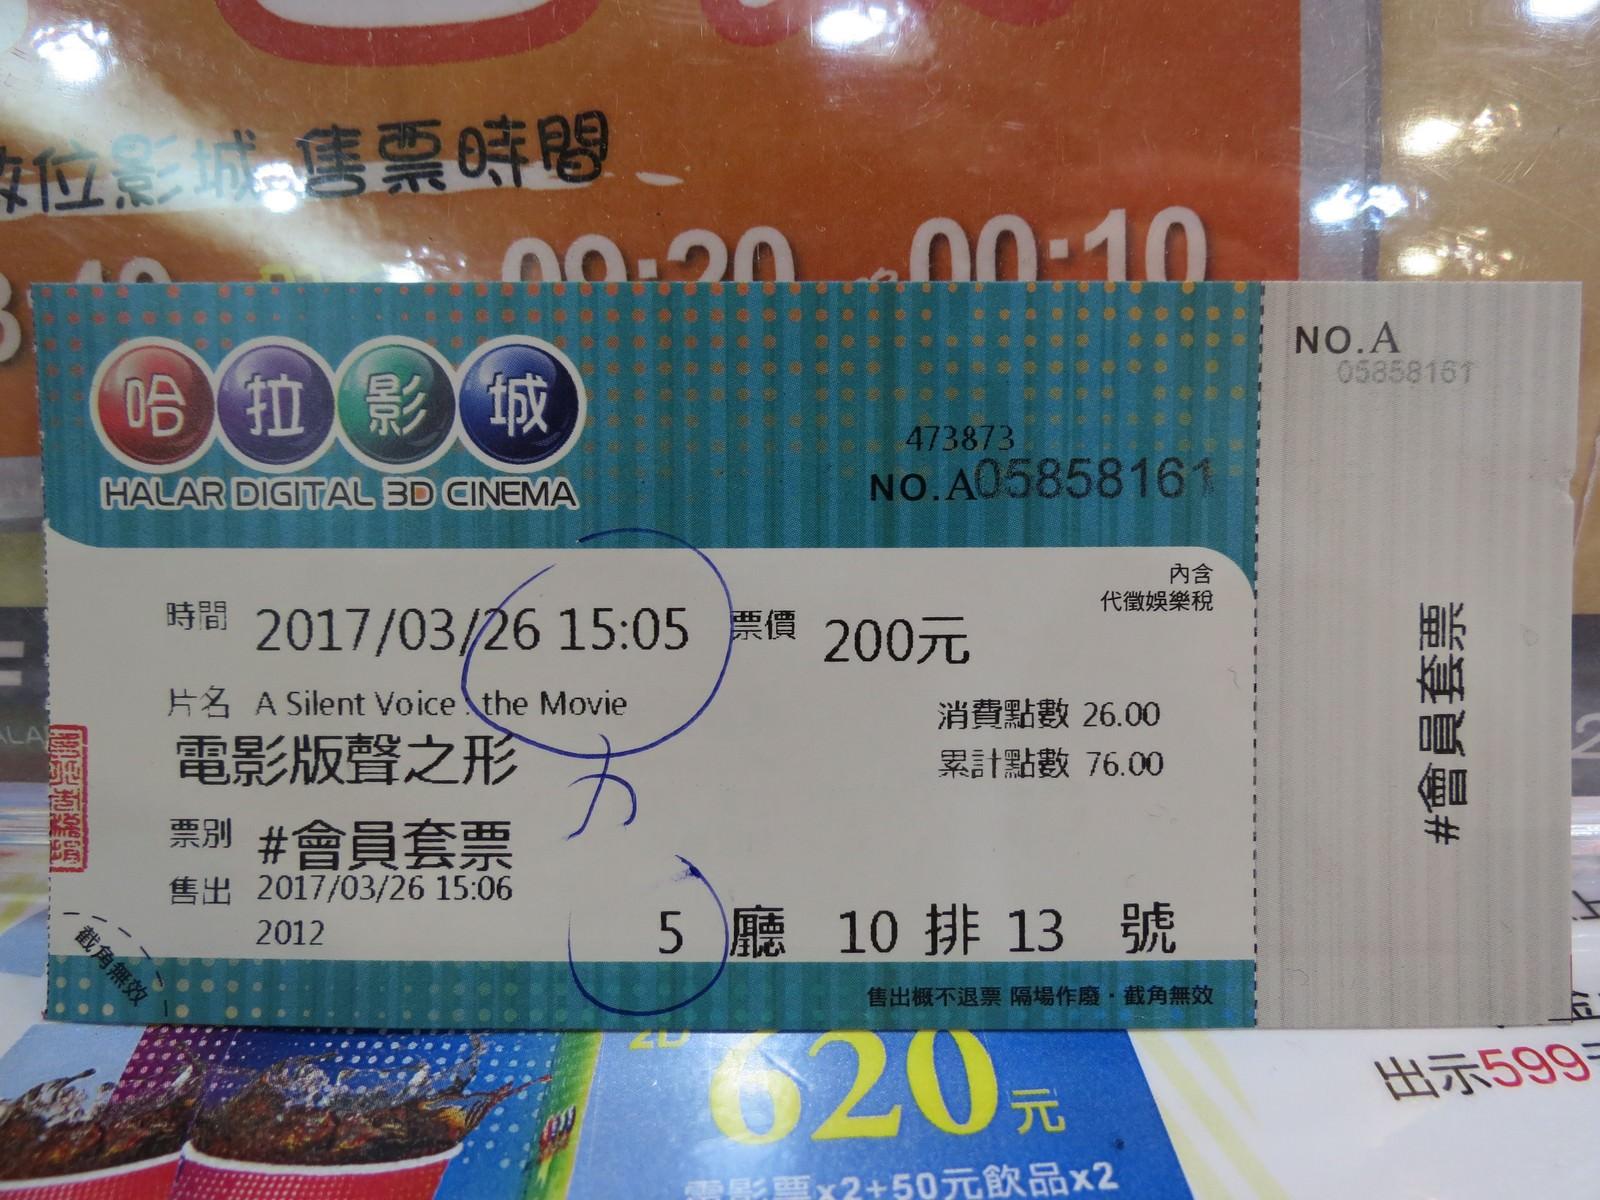 Movie, 映画『聲の形』(日本, 2016年) / 電影版聲之形(台灣) / A Silent Voice: the Movie(英文), 電影票